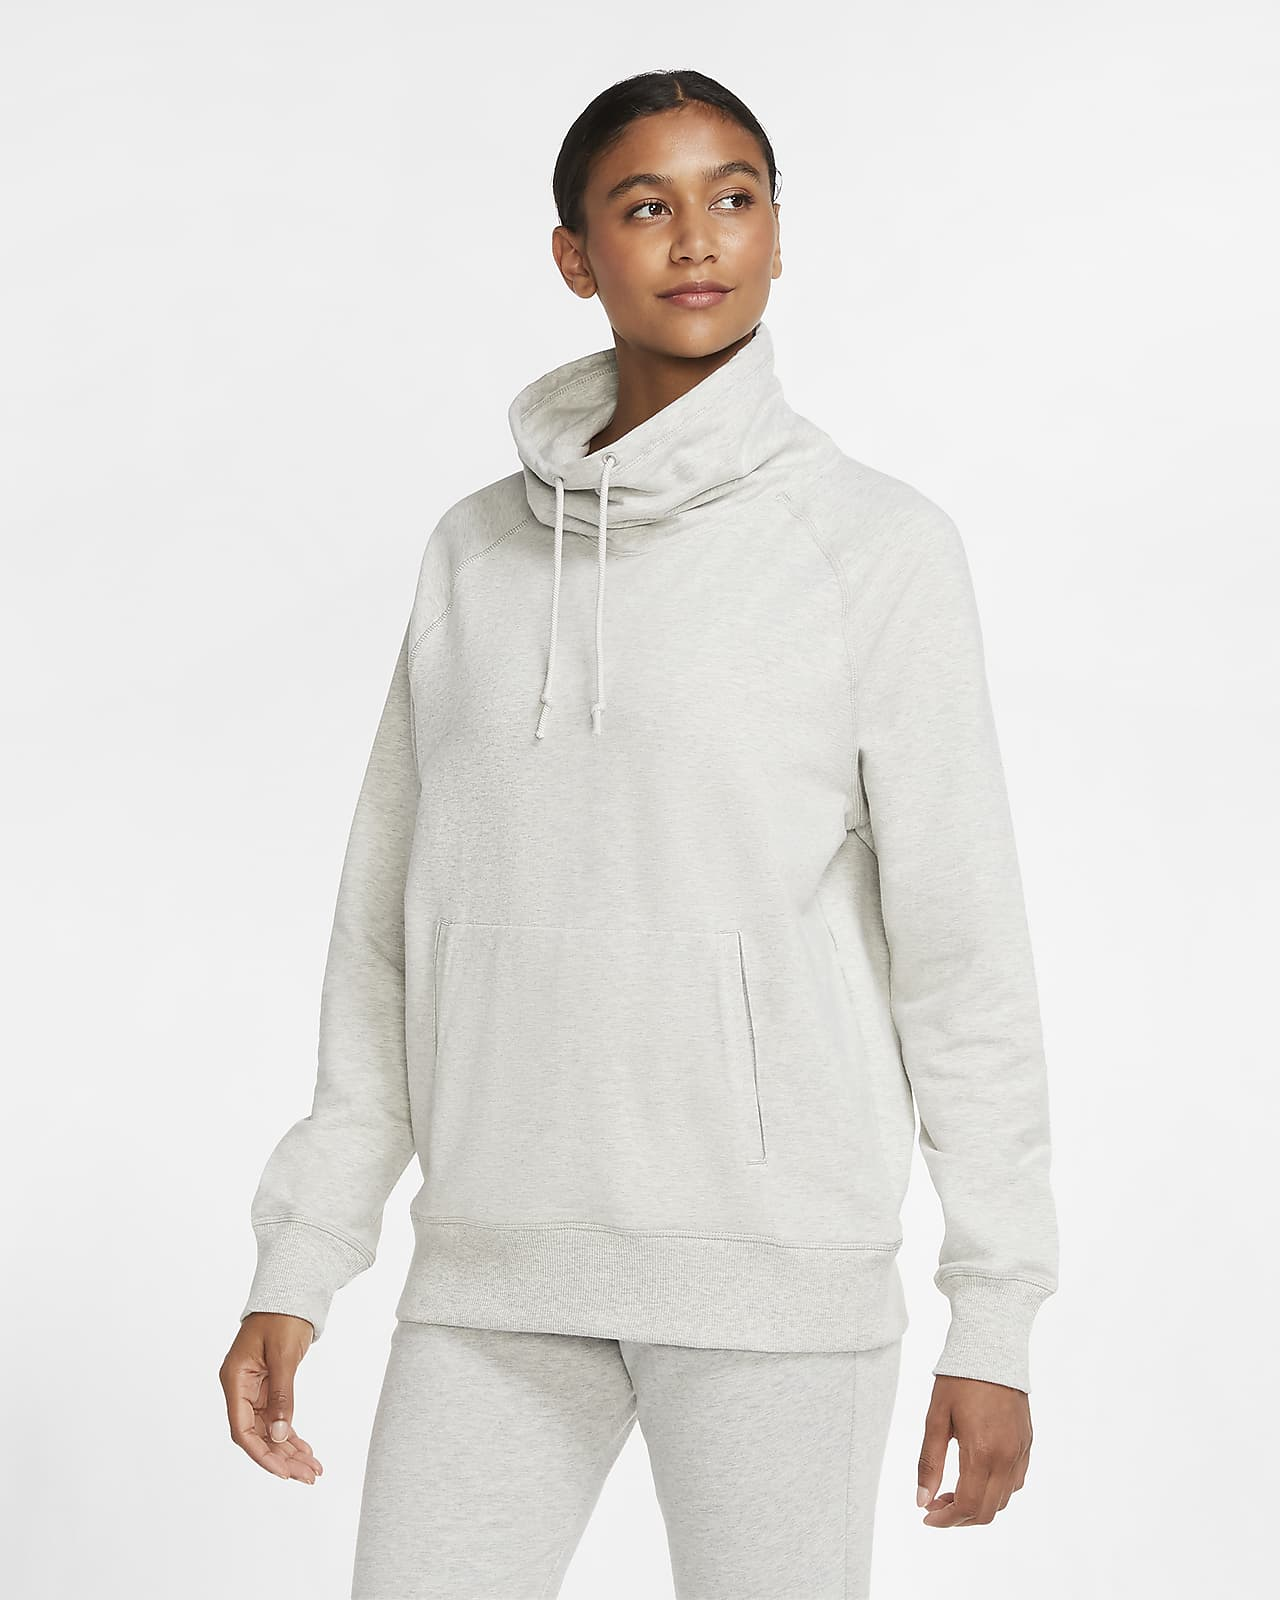 Nike Yoga Women's Top